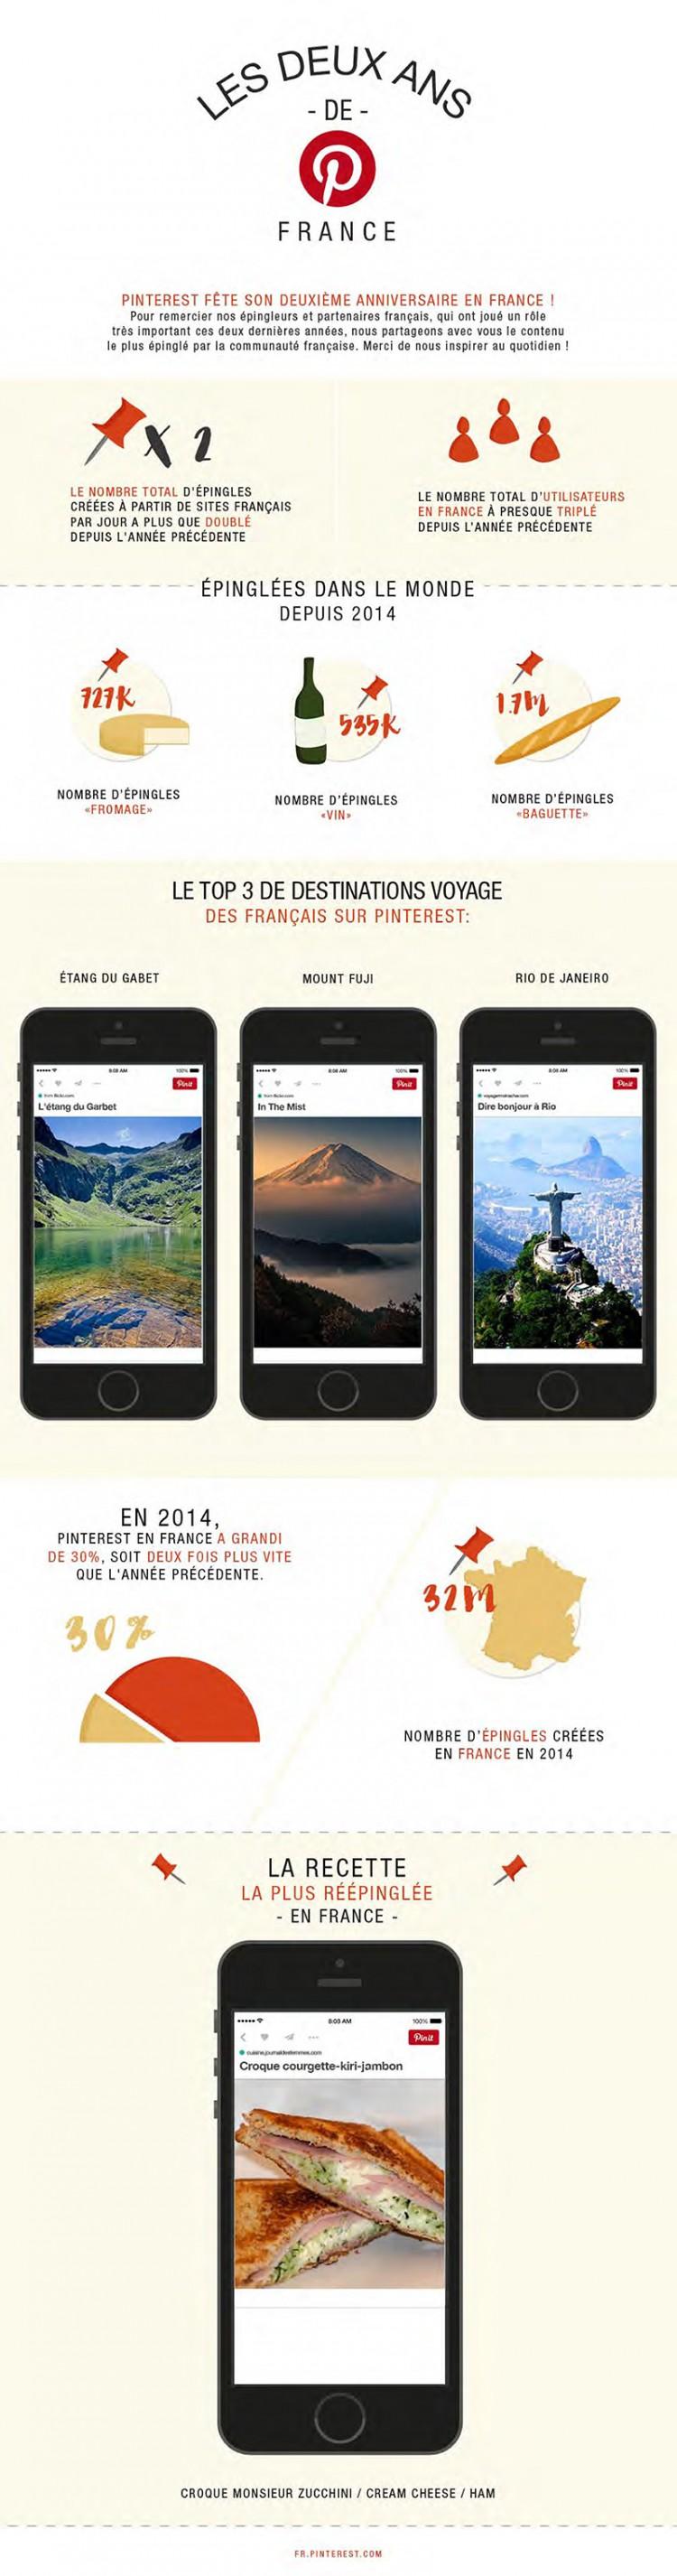 Anniversaire Pinterest France